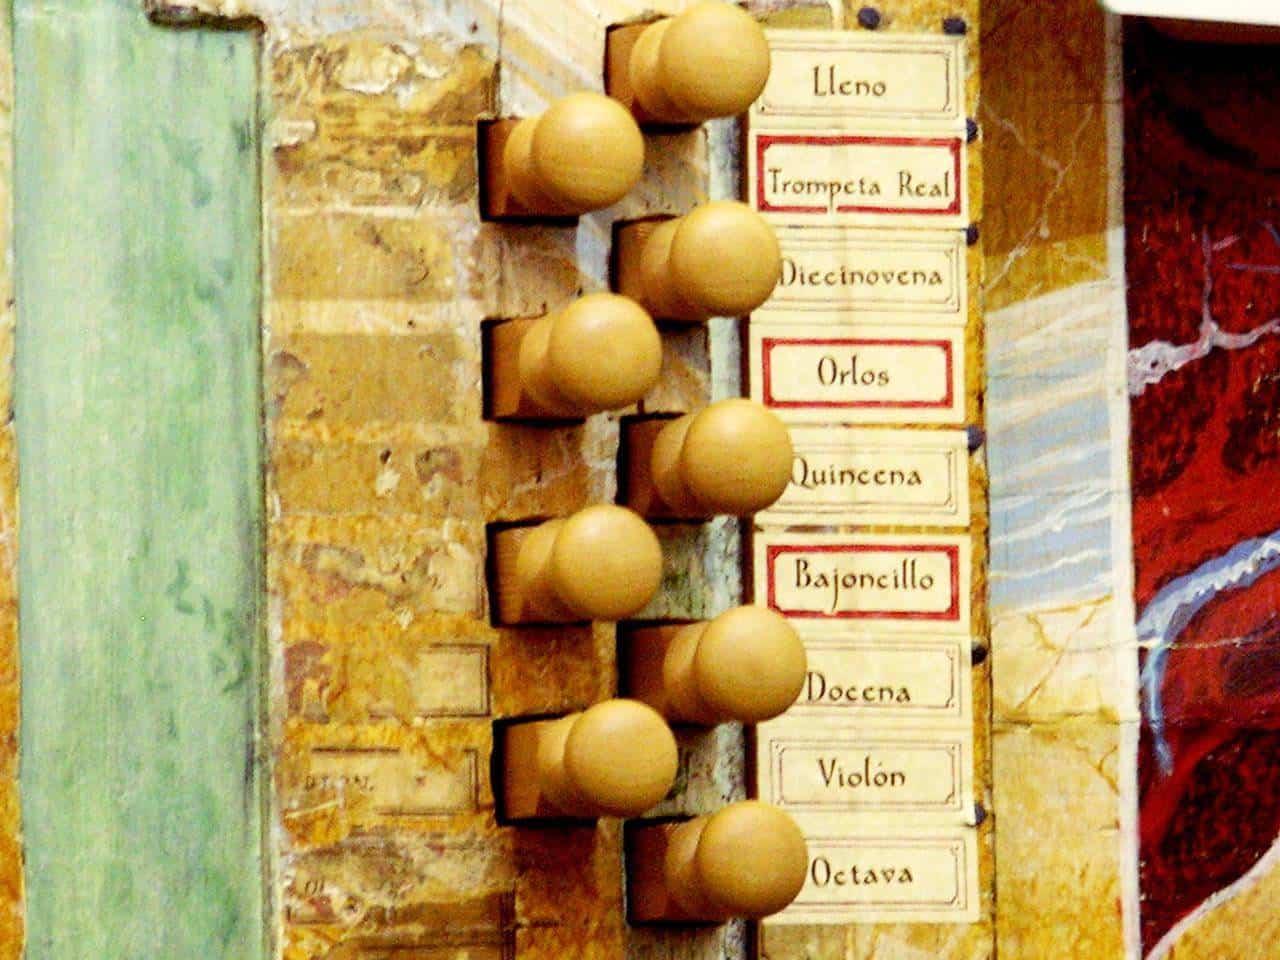 Herencia se suma a la IV Ruta de Órganos Históricos de Castilla-La Mancha 3